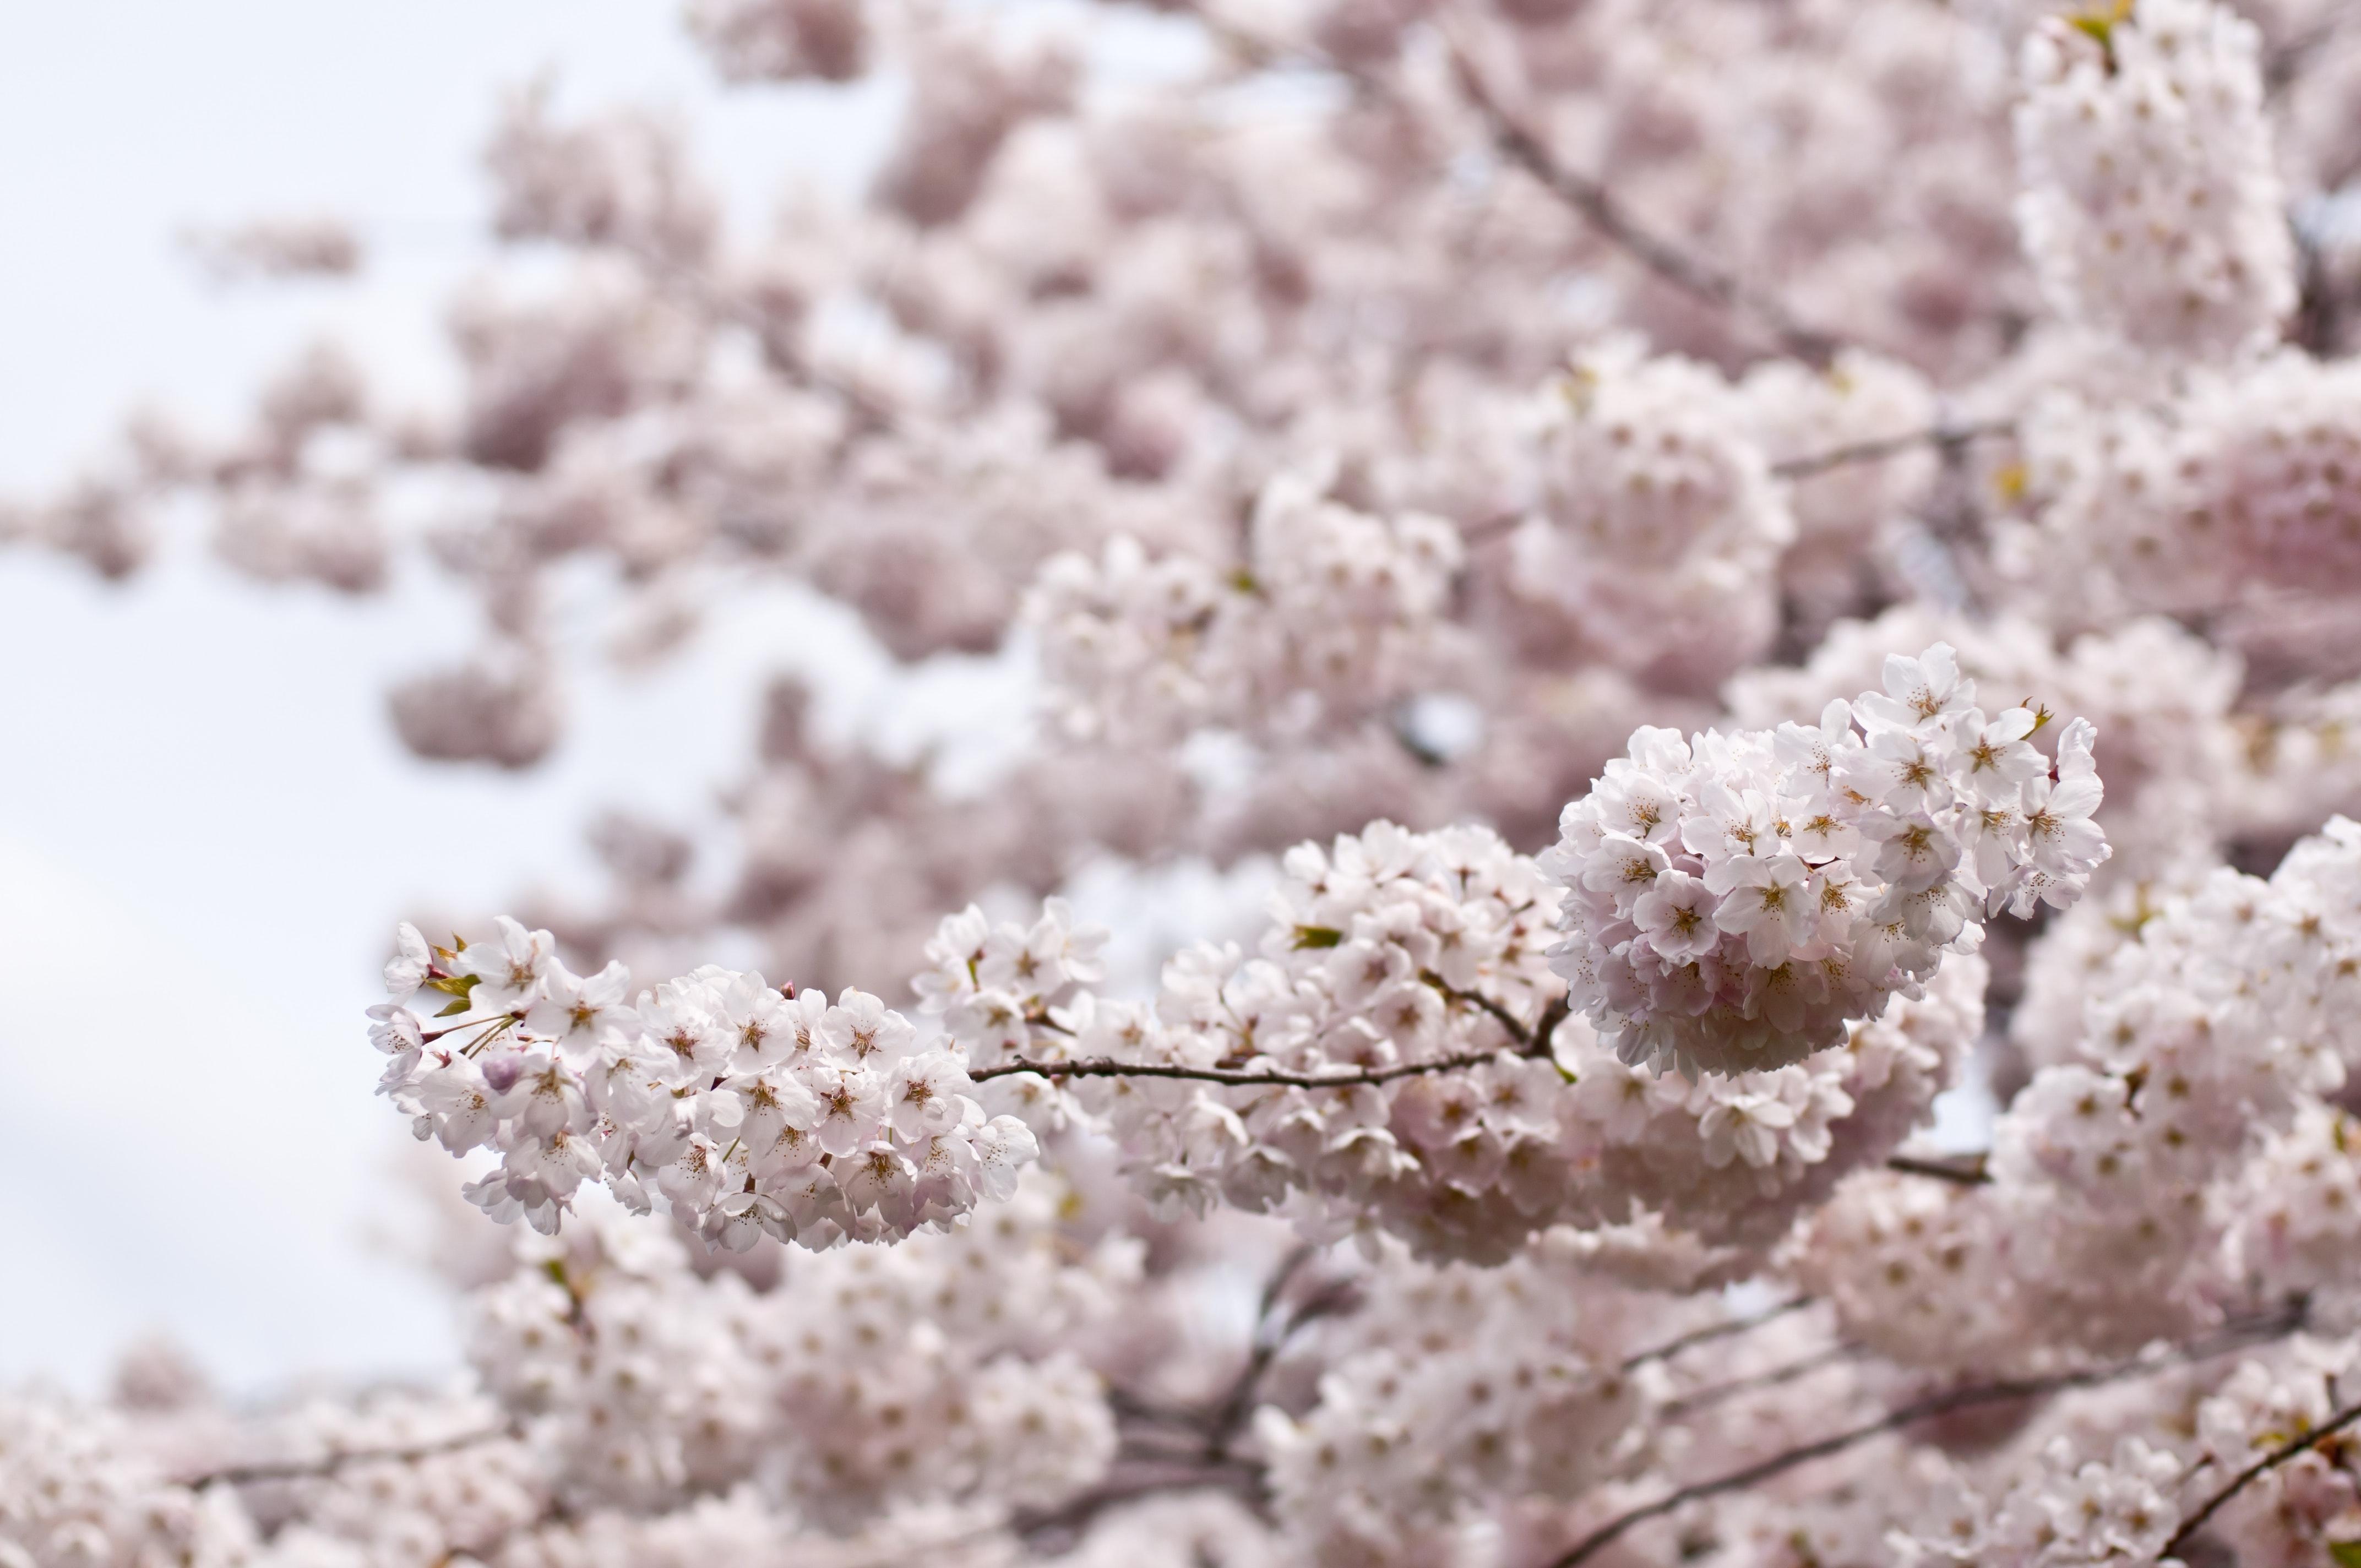 White Flowers, Bloom, Blossom, Cherry blossom, Flora, HQ Photo